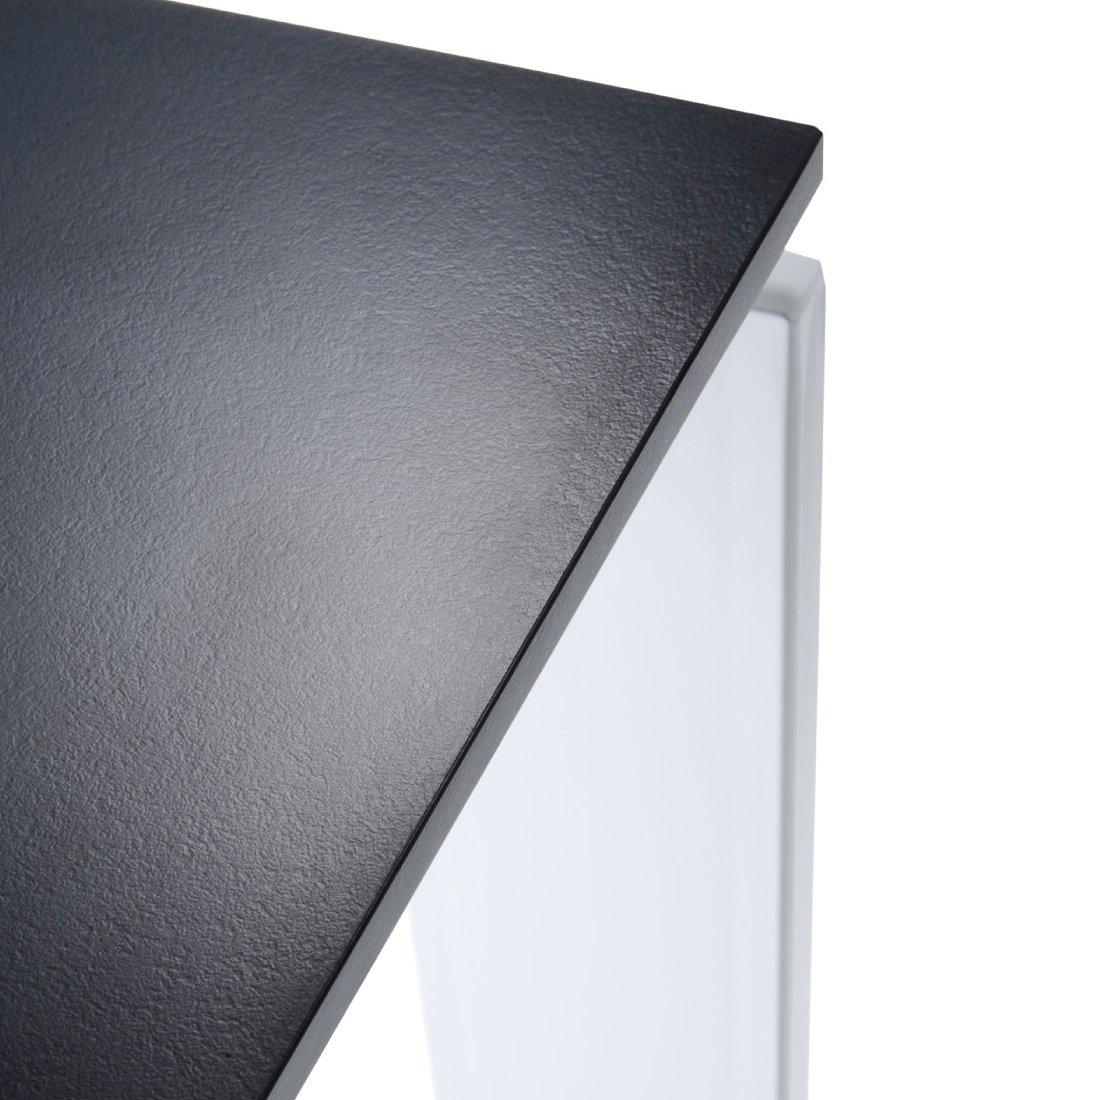 Kartell Four Eettafel 223 x 79 cm - Zwart - Aluminium